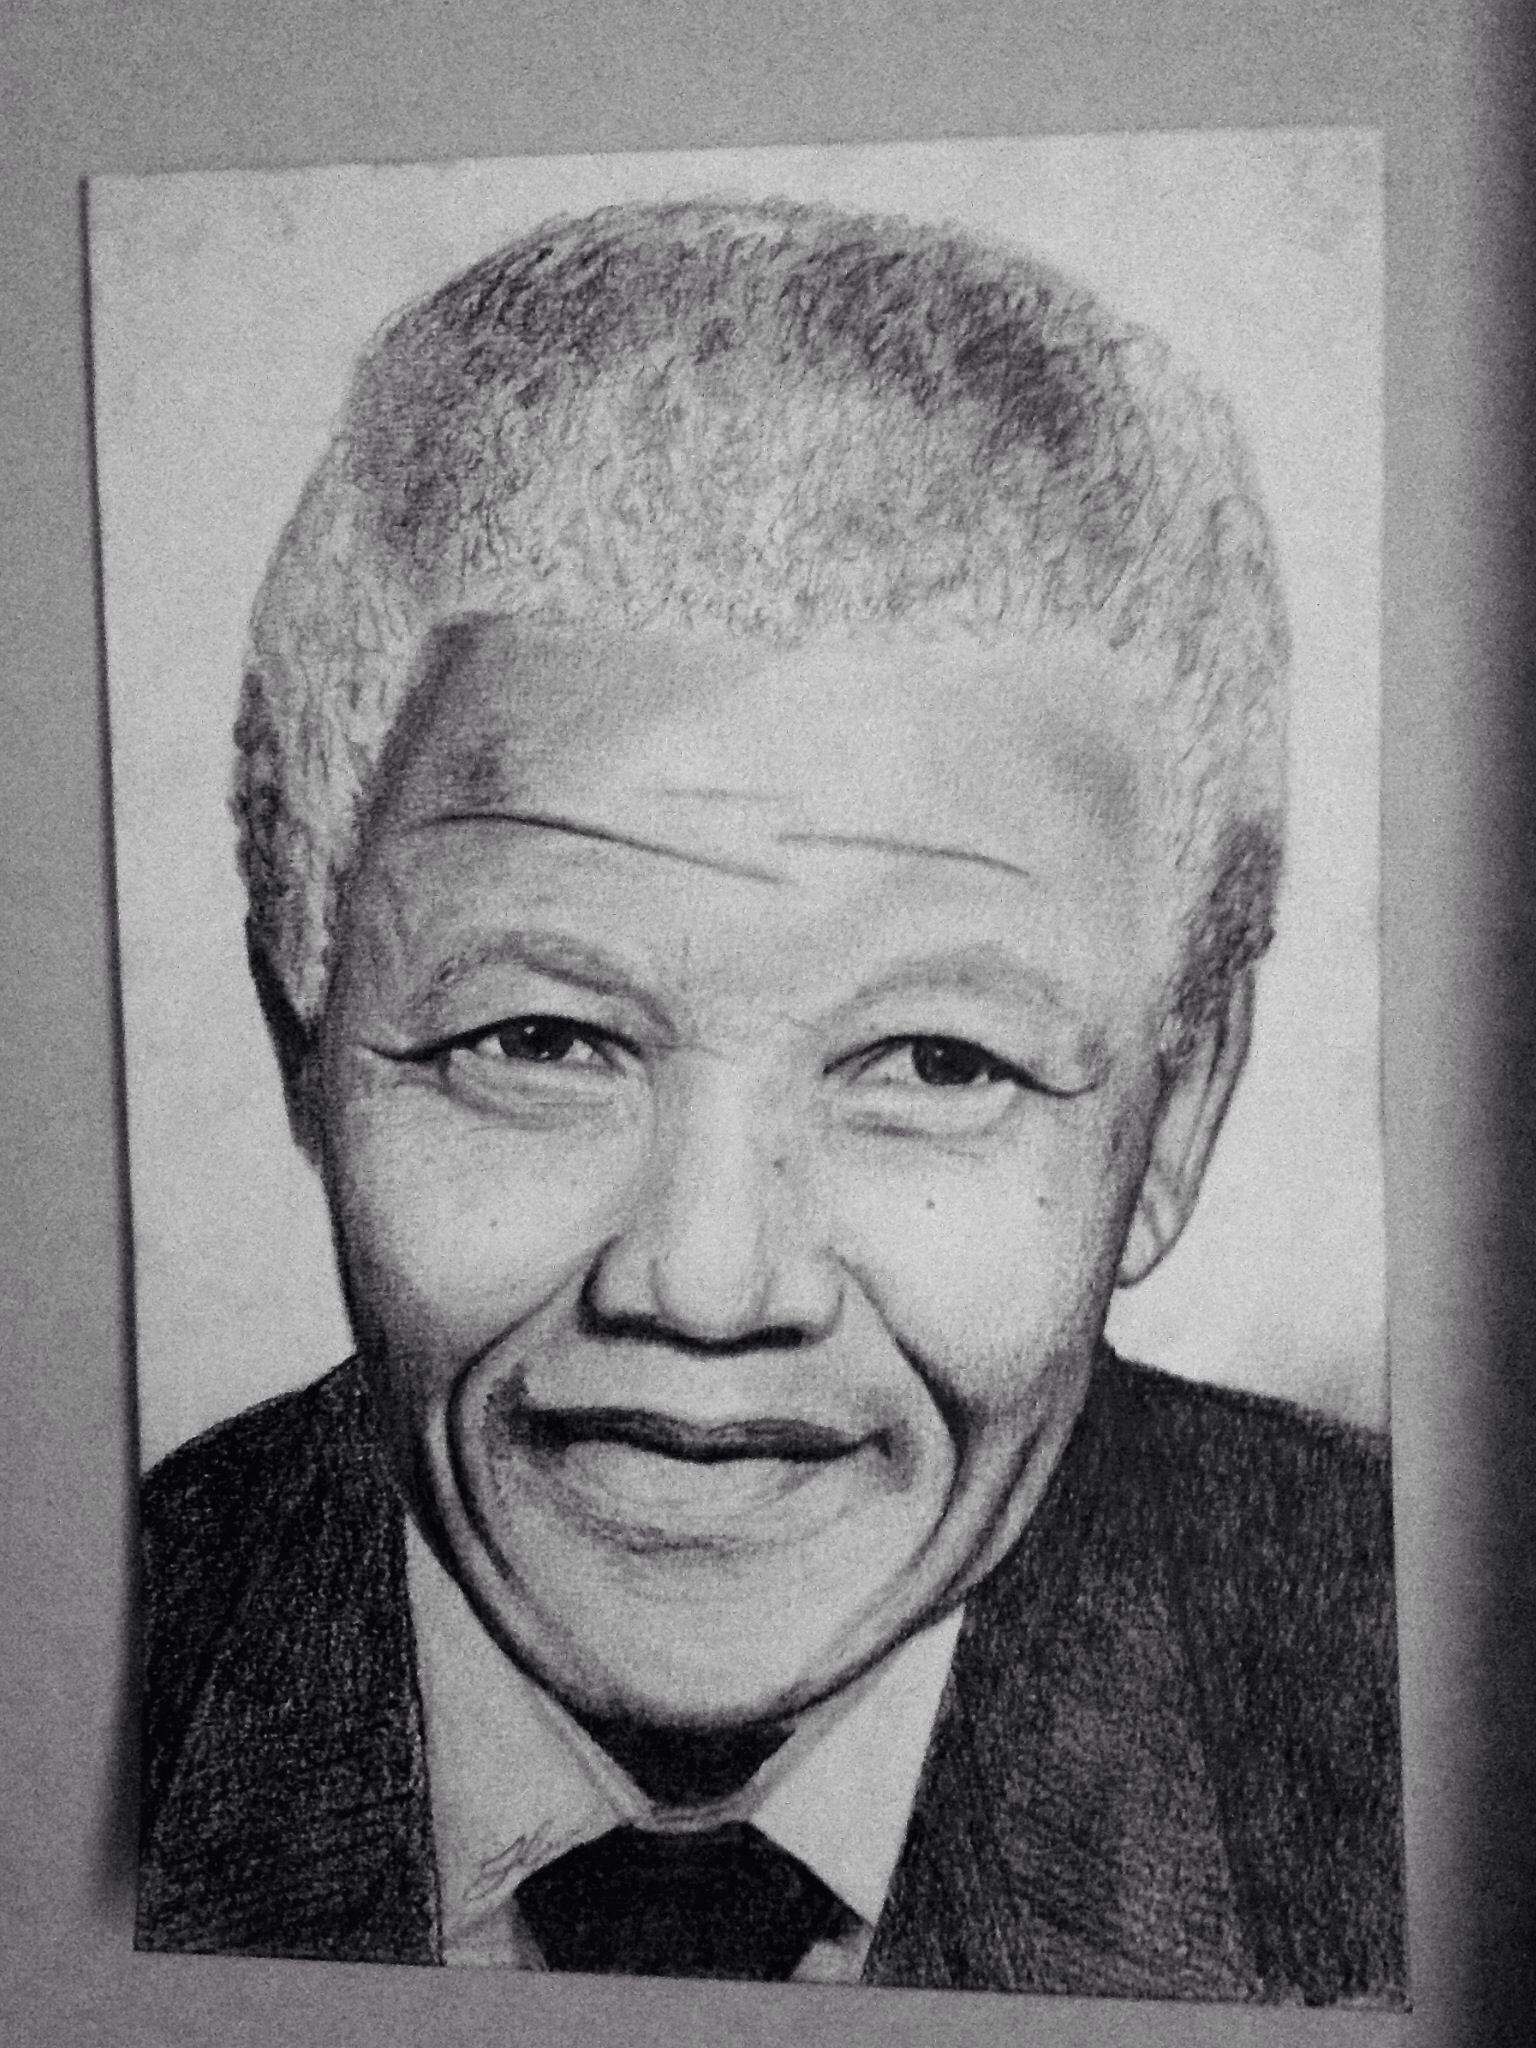 Nelson mandela pencil sketch portrait drawing next drawings